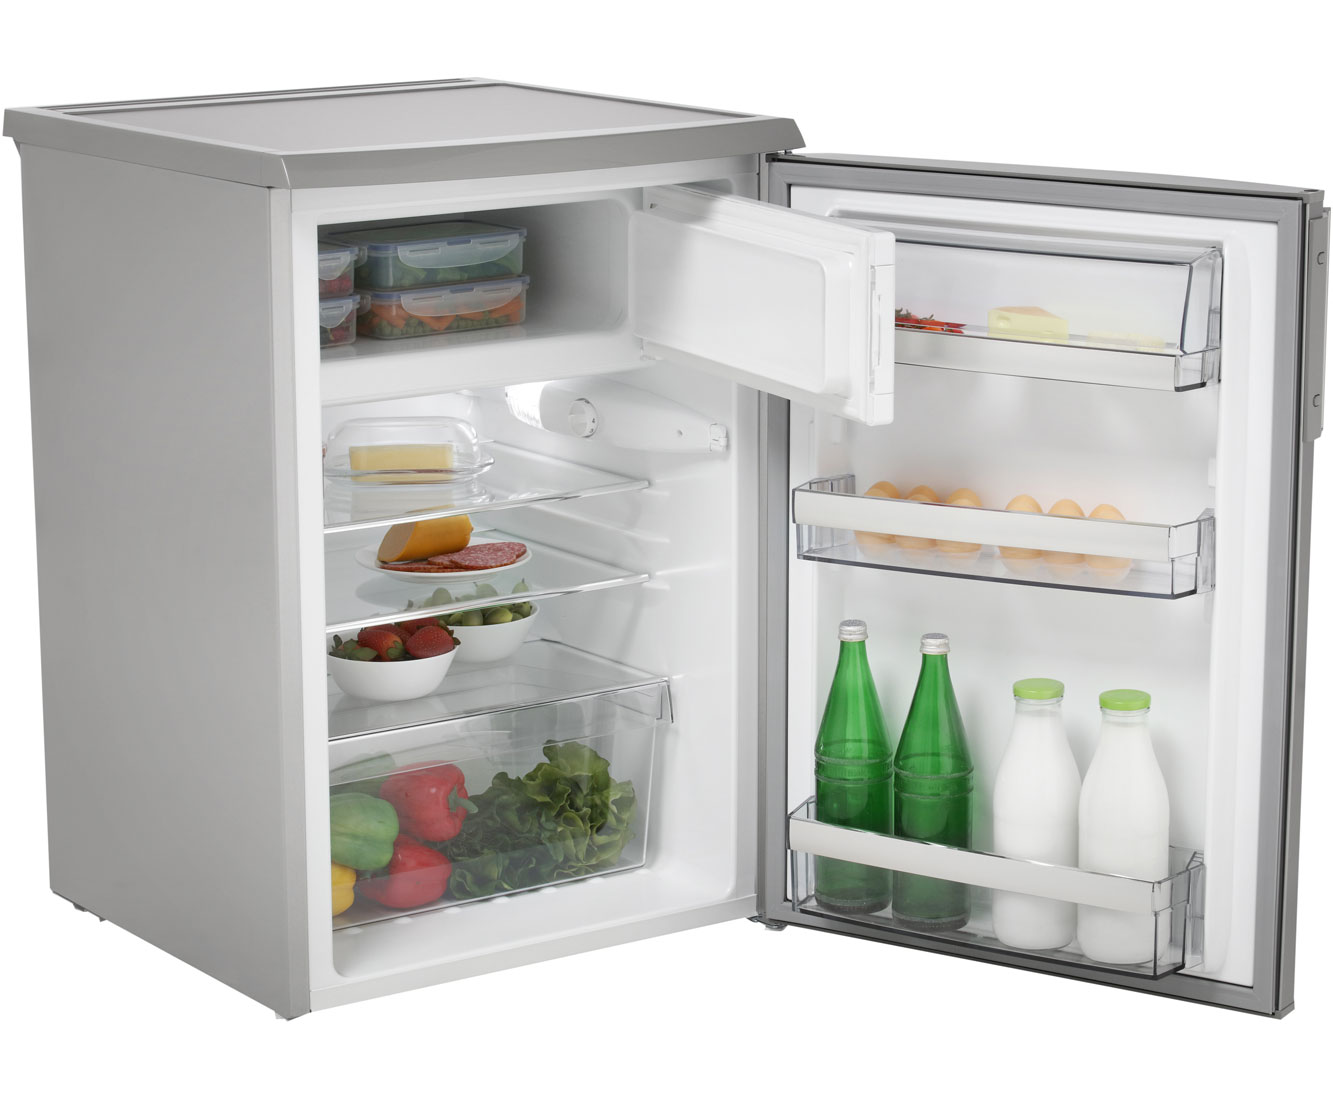 Aeg Unterbau Kühlschrank Ohne Gefrierfach : Aeg santo rtb ax kühlschrank mit gefrierfach edelstahl a